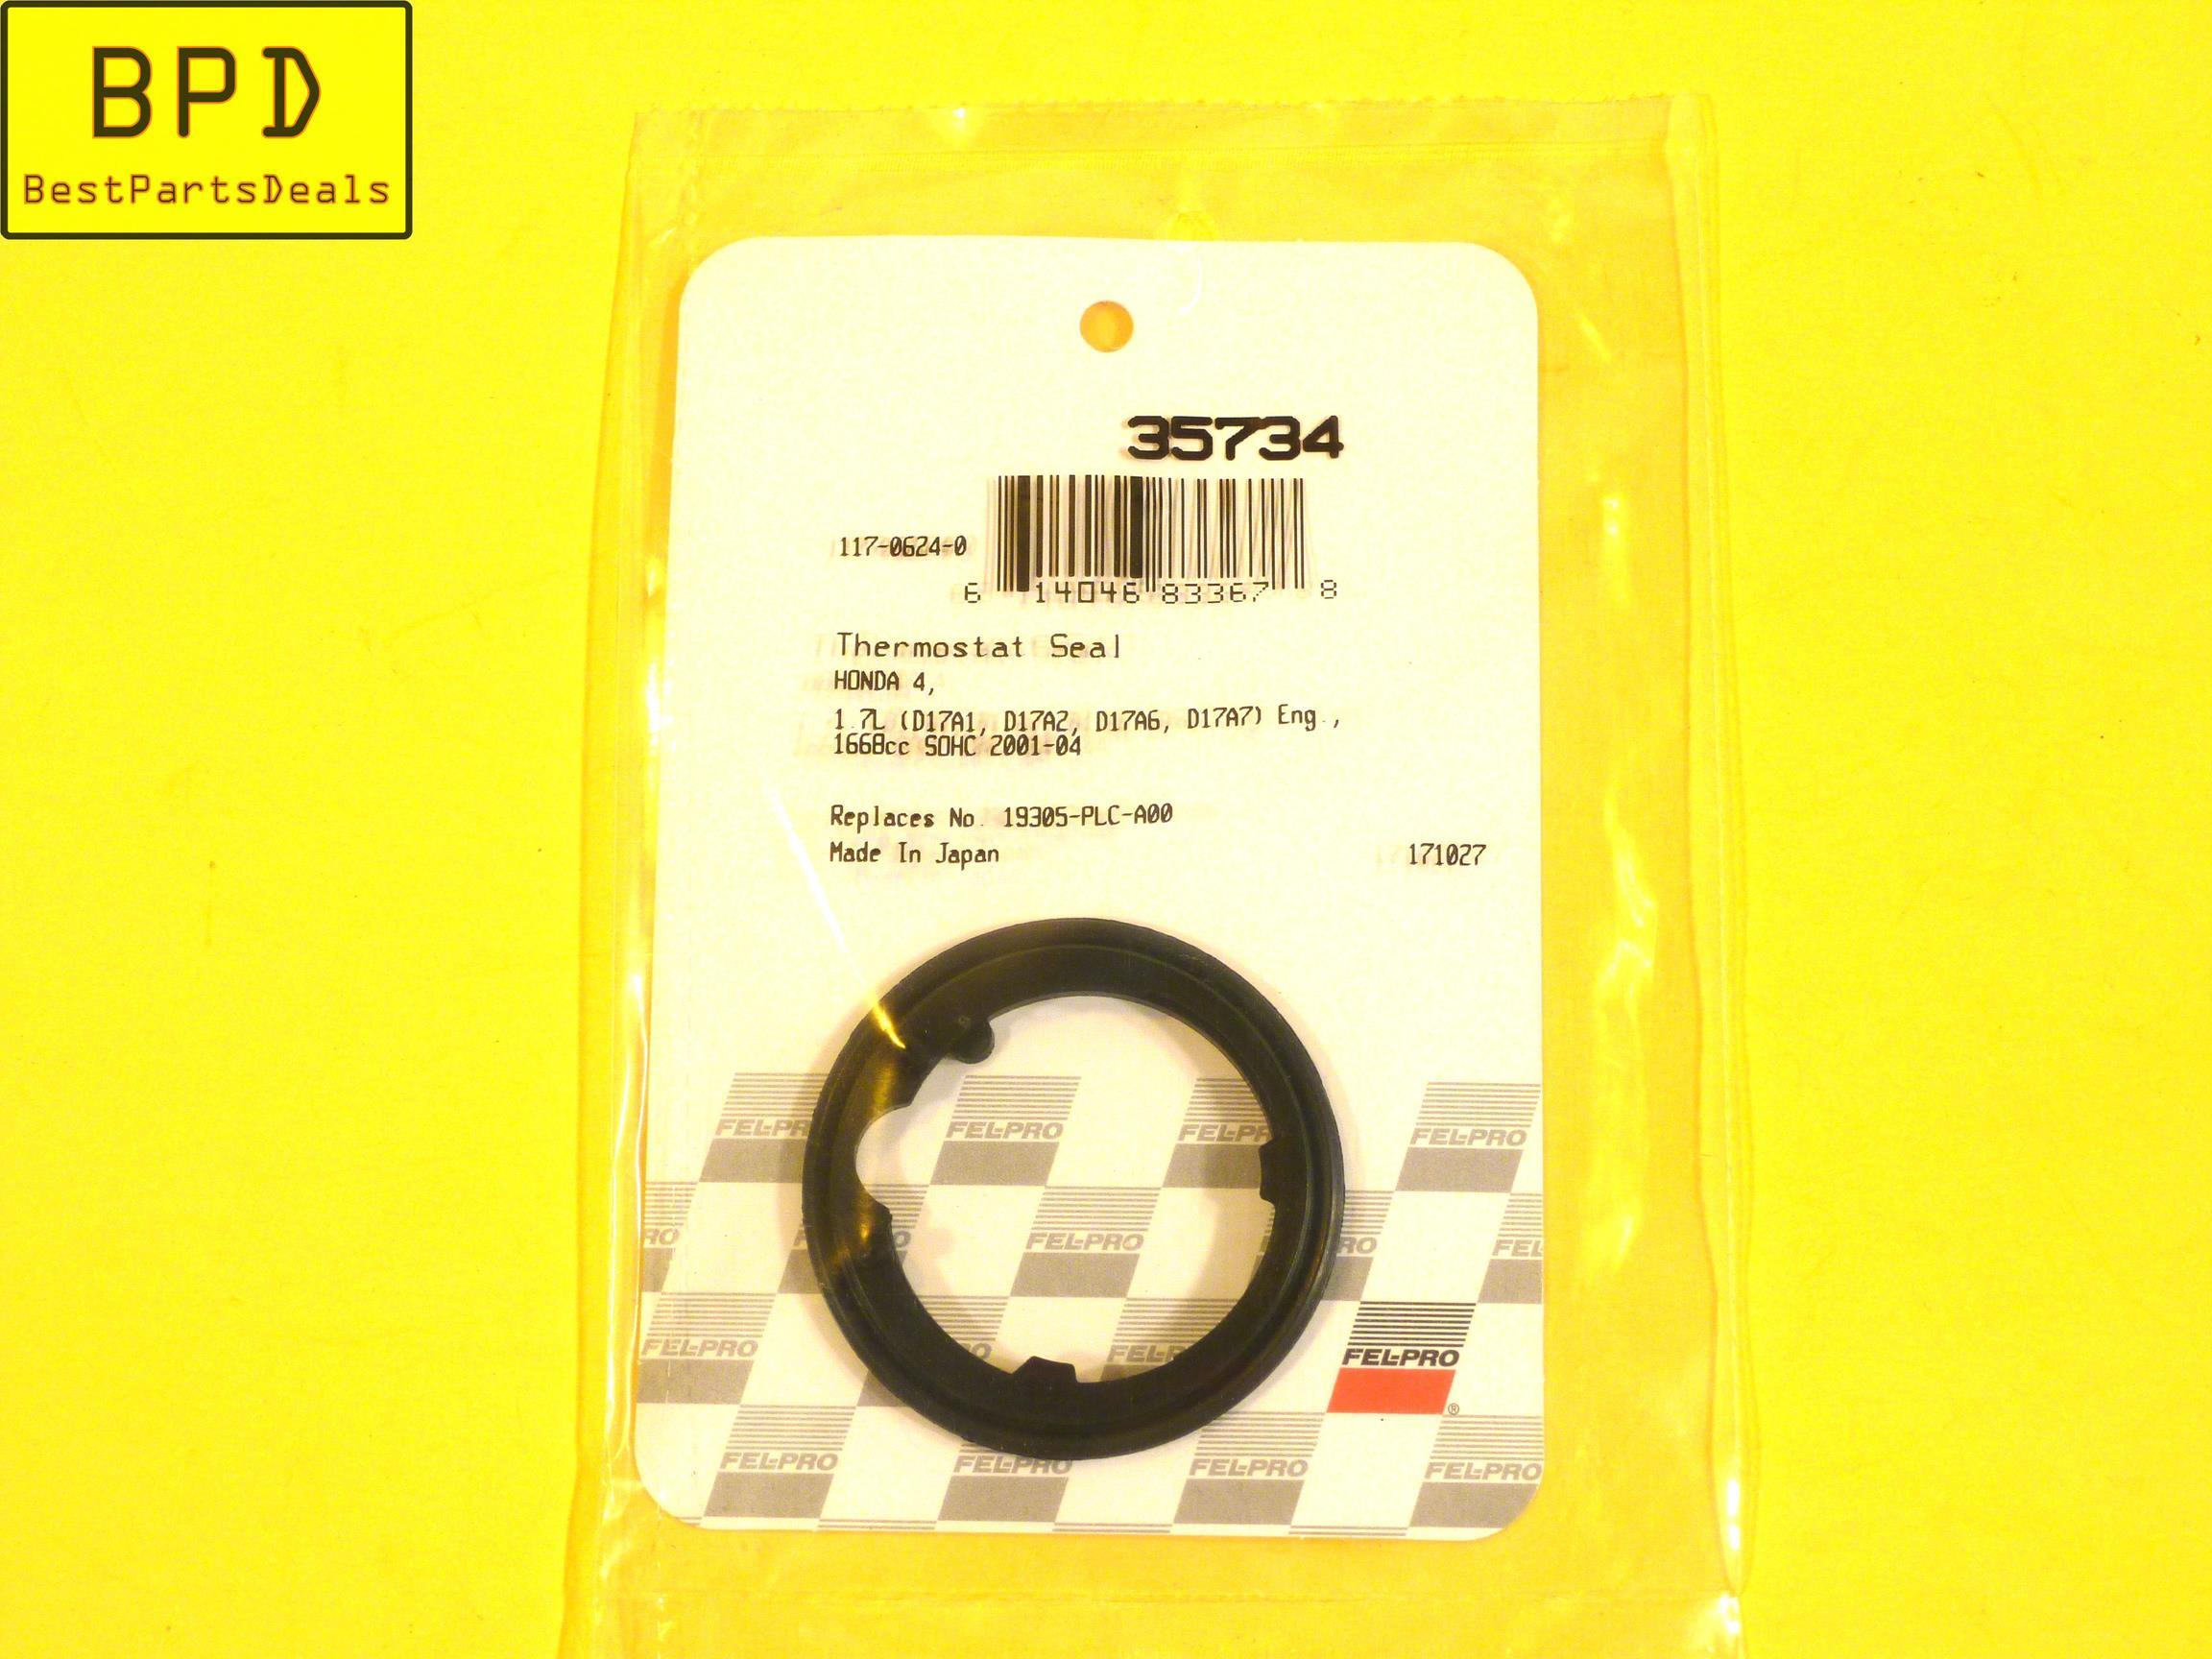 Fel-Pro 35734 Thermostat Seal